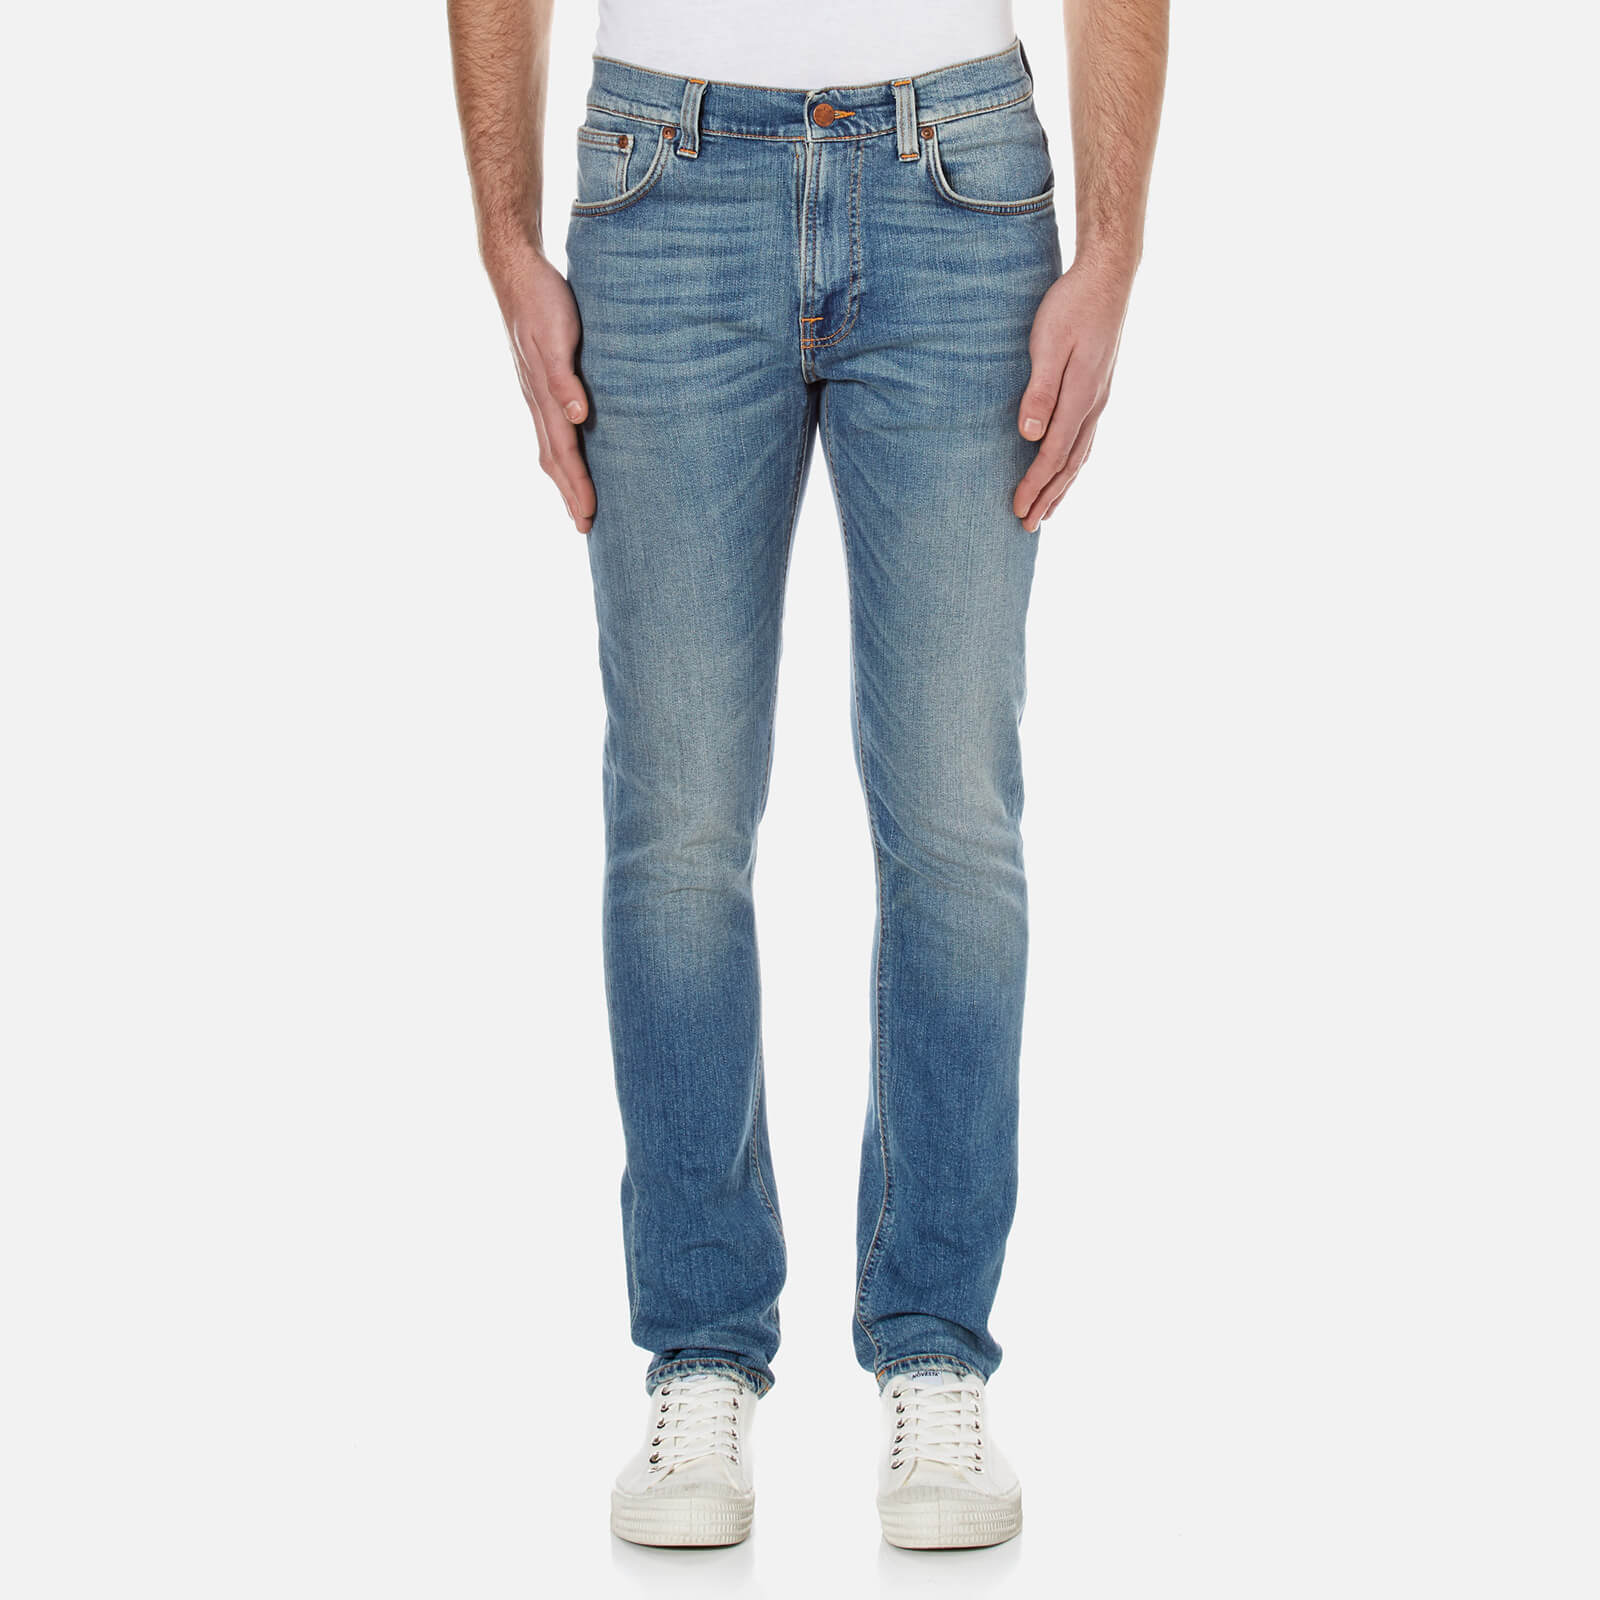 b065f1764085 Nudie Jeans Men s Long John Skinny Jeans - Black Blizzard - Free UK  Delivery over £50